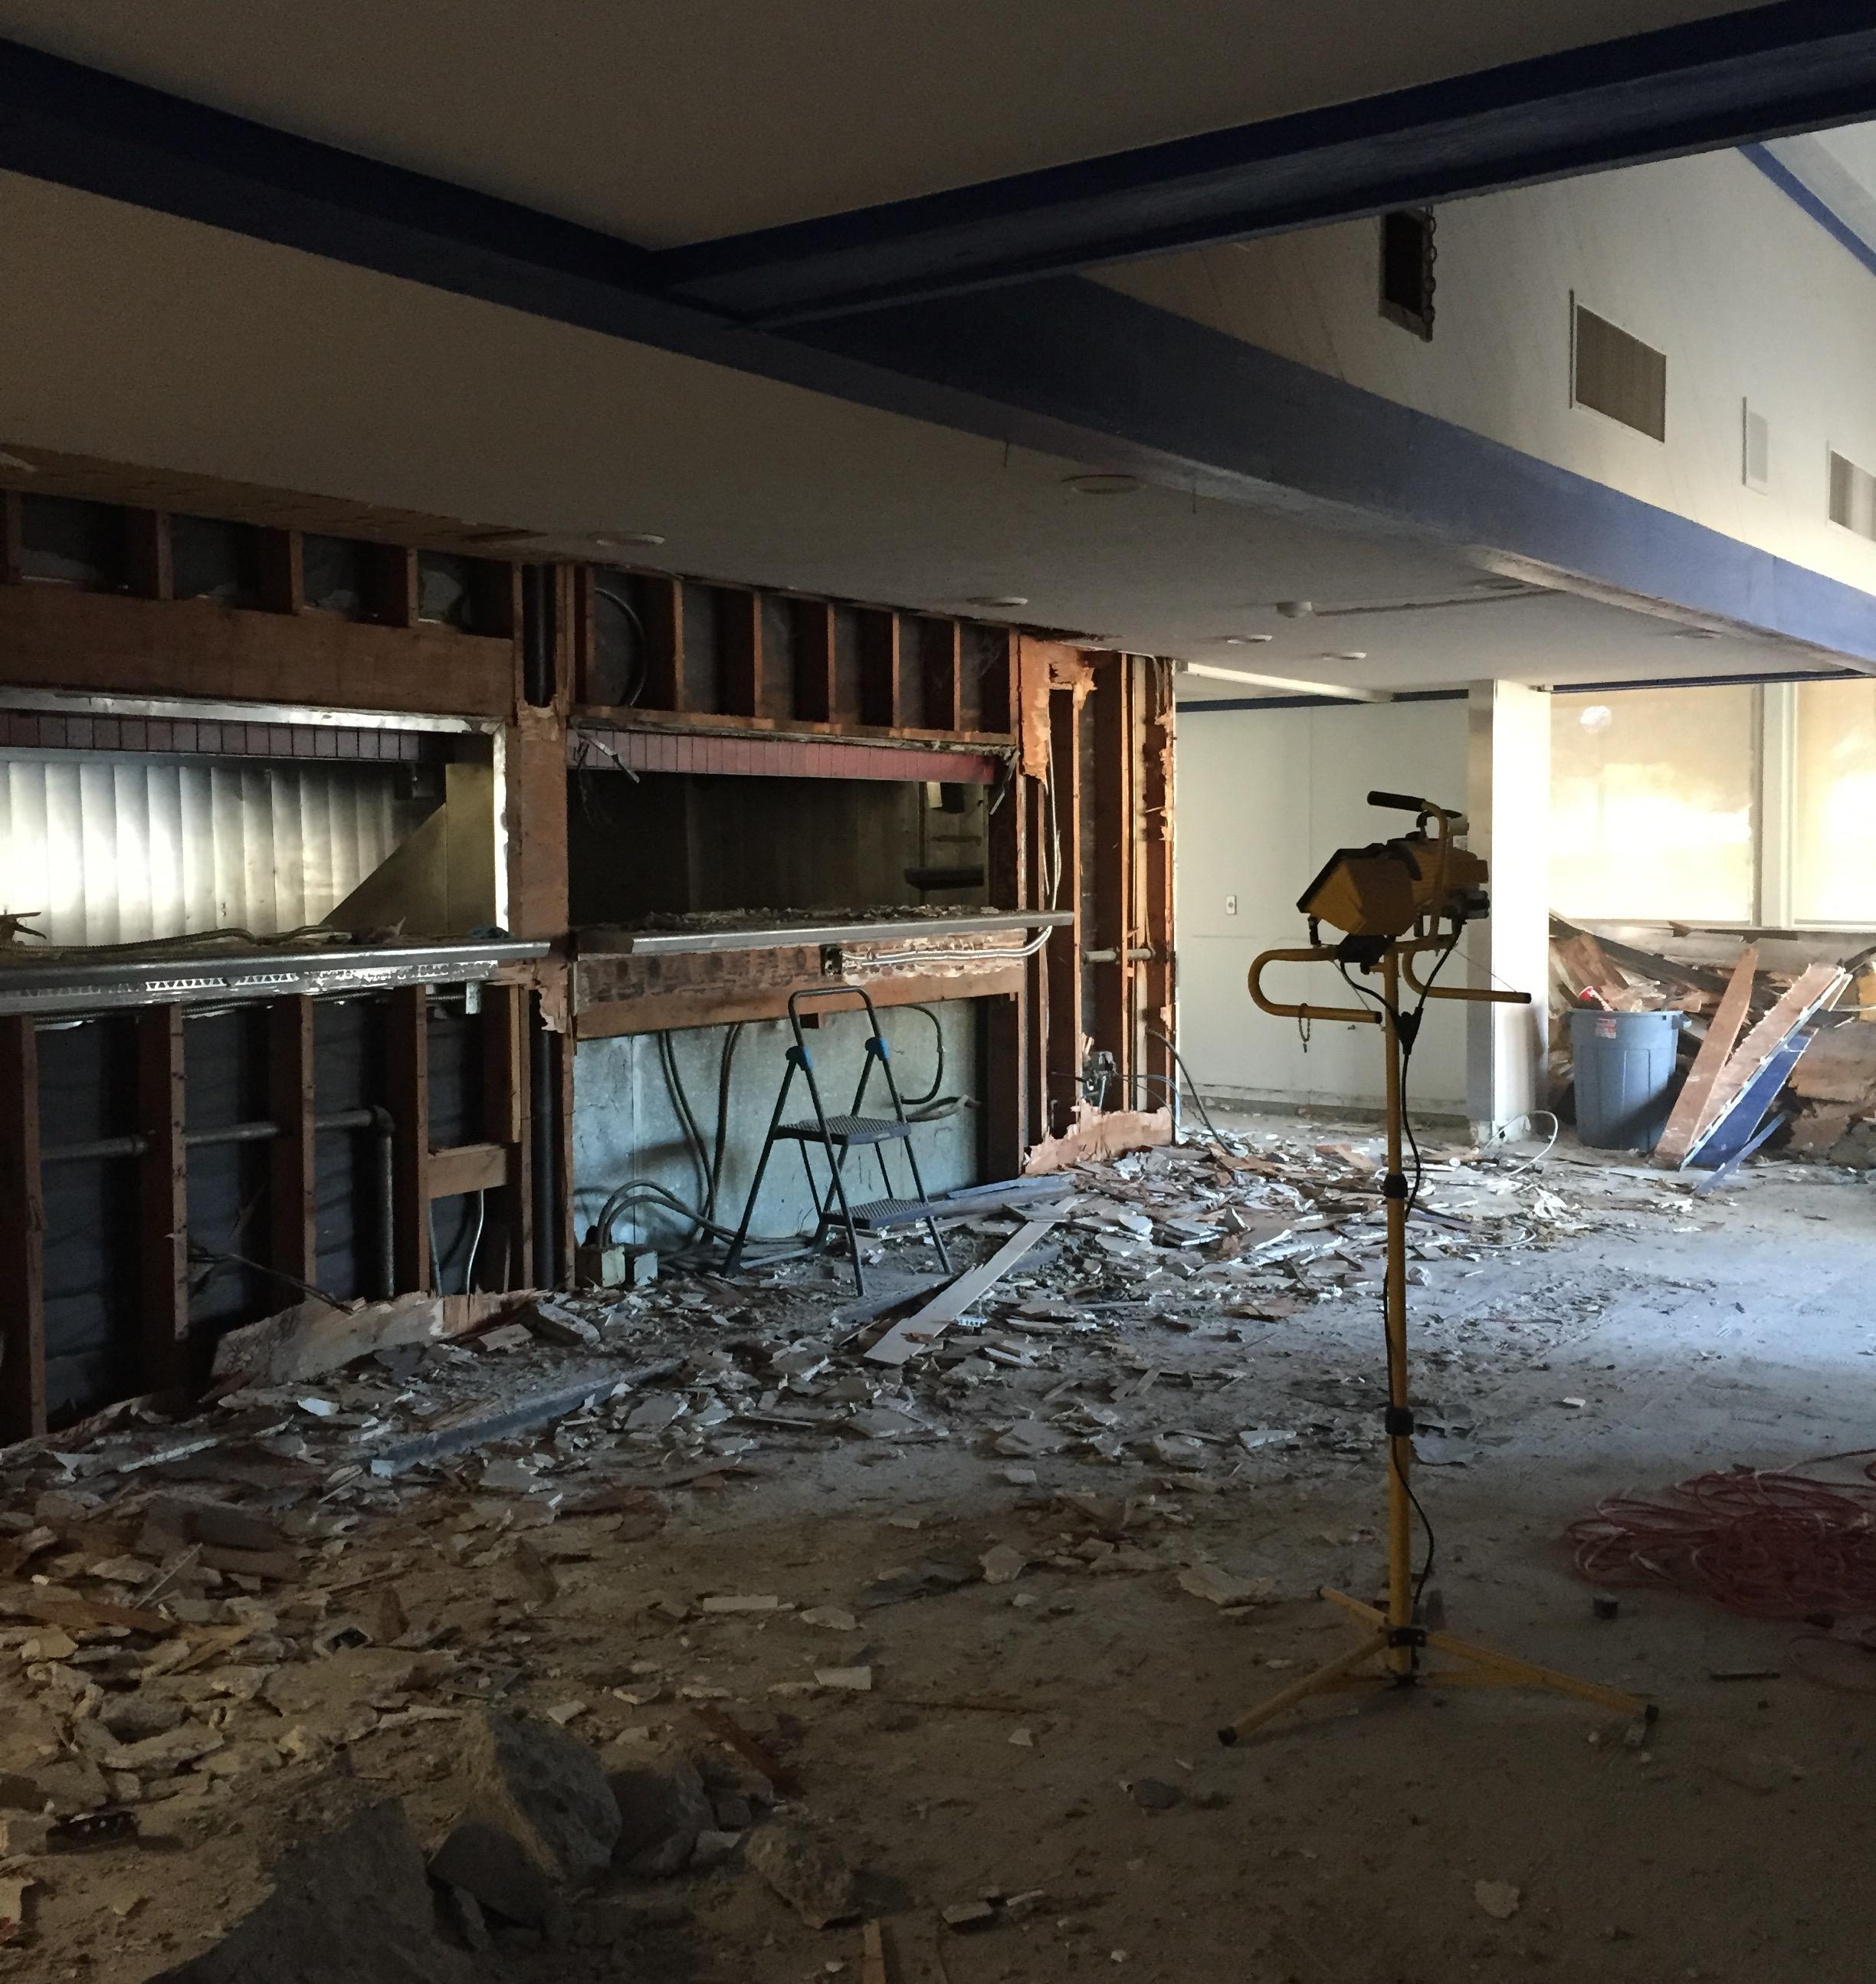 Demolition underway at the new Beacon Coffee location.